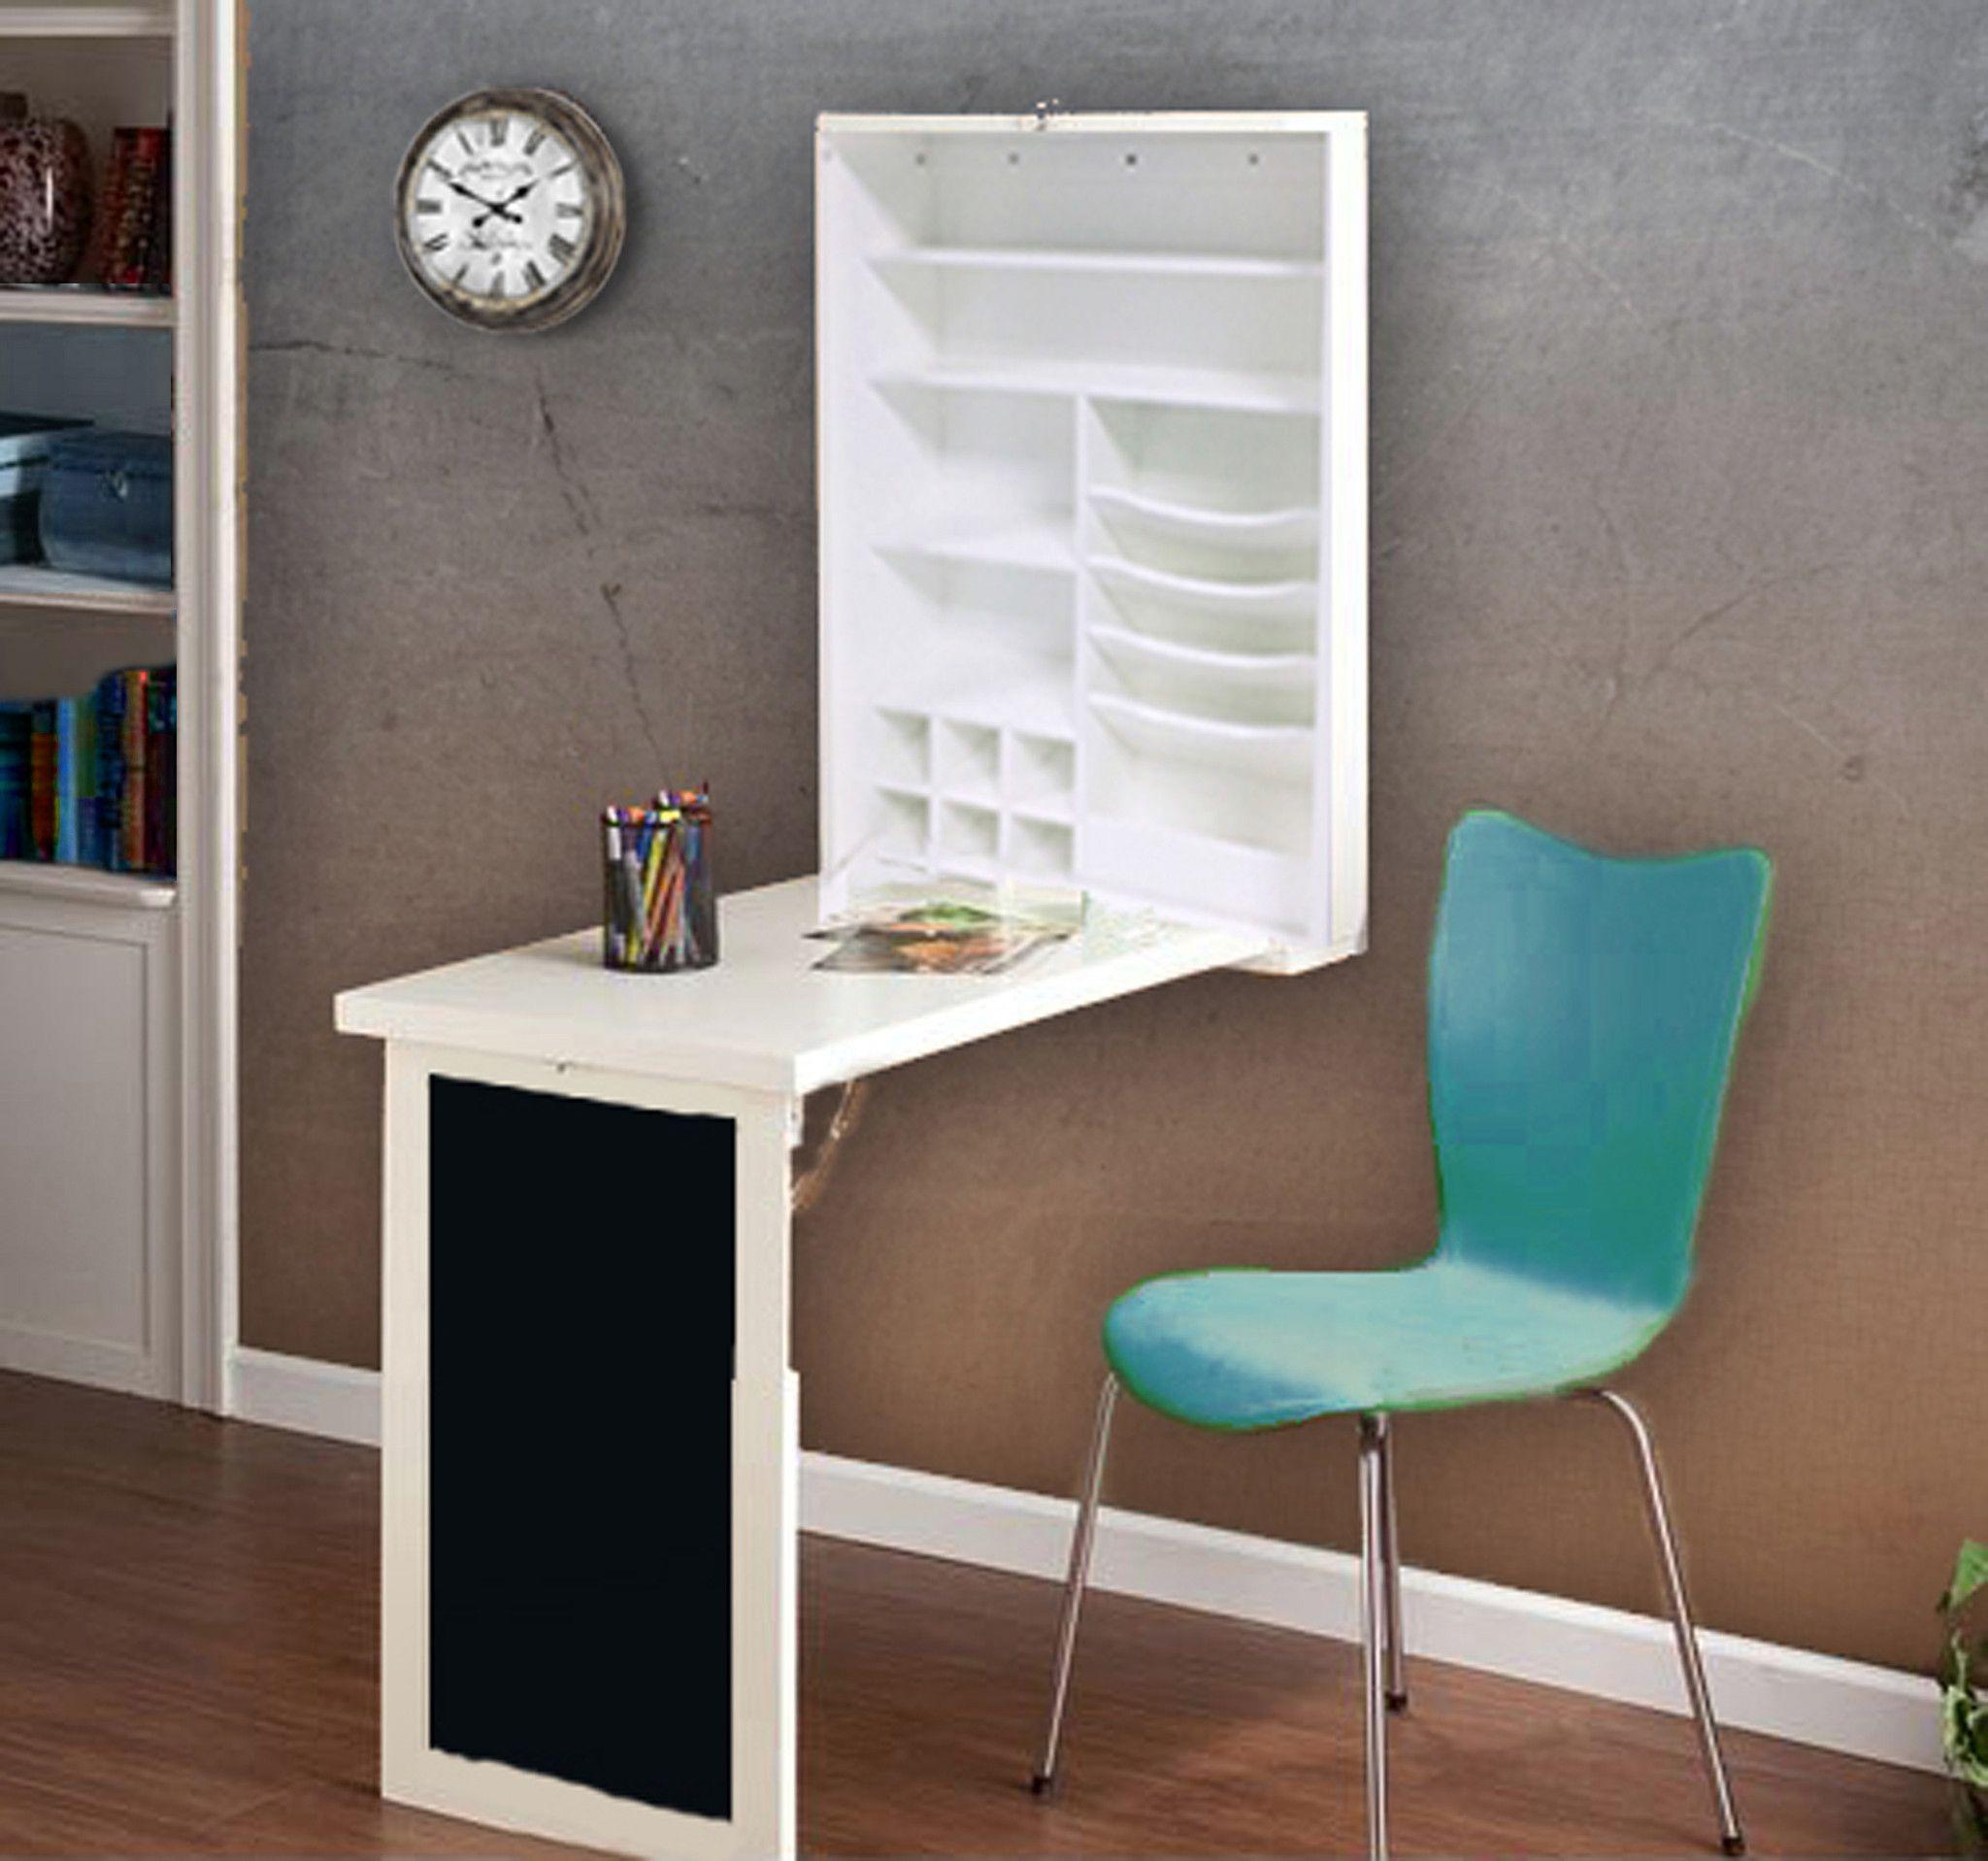 Medium Of Teen Fold Out Chair